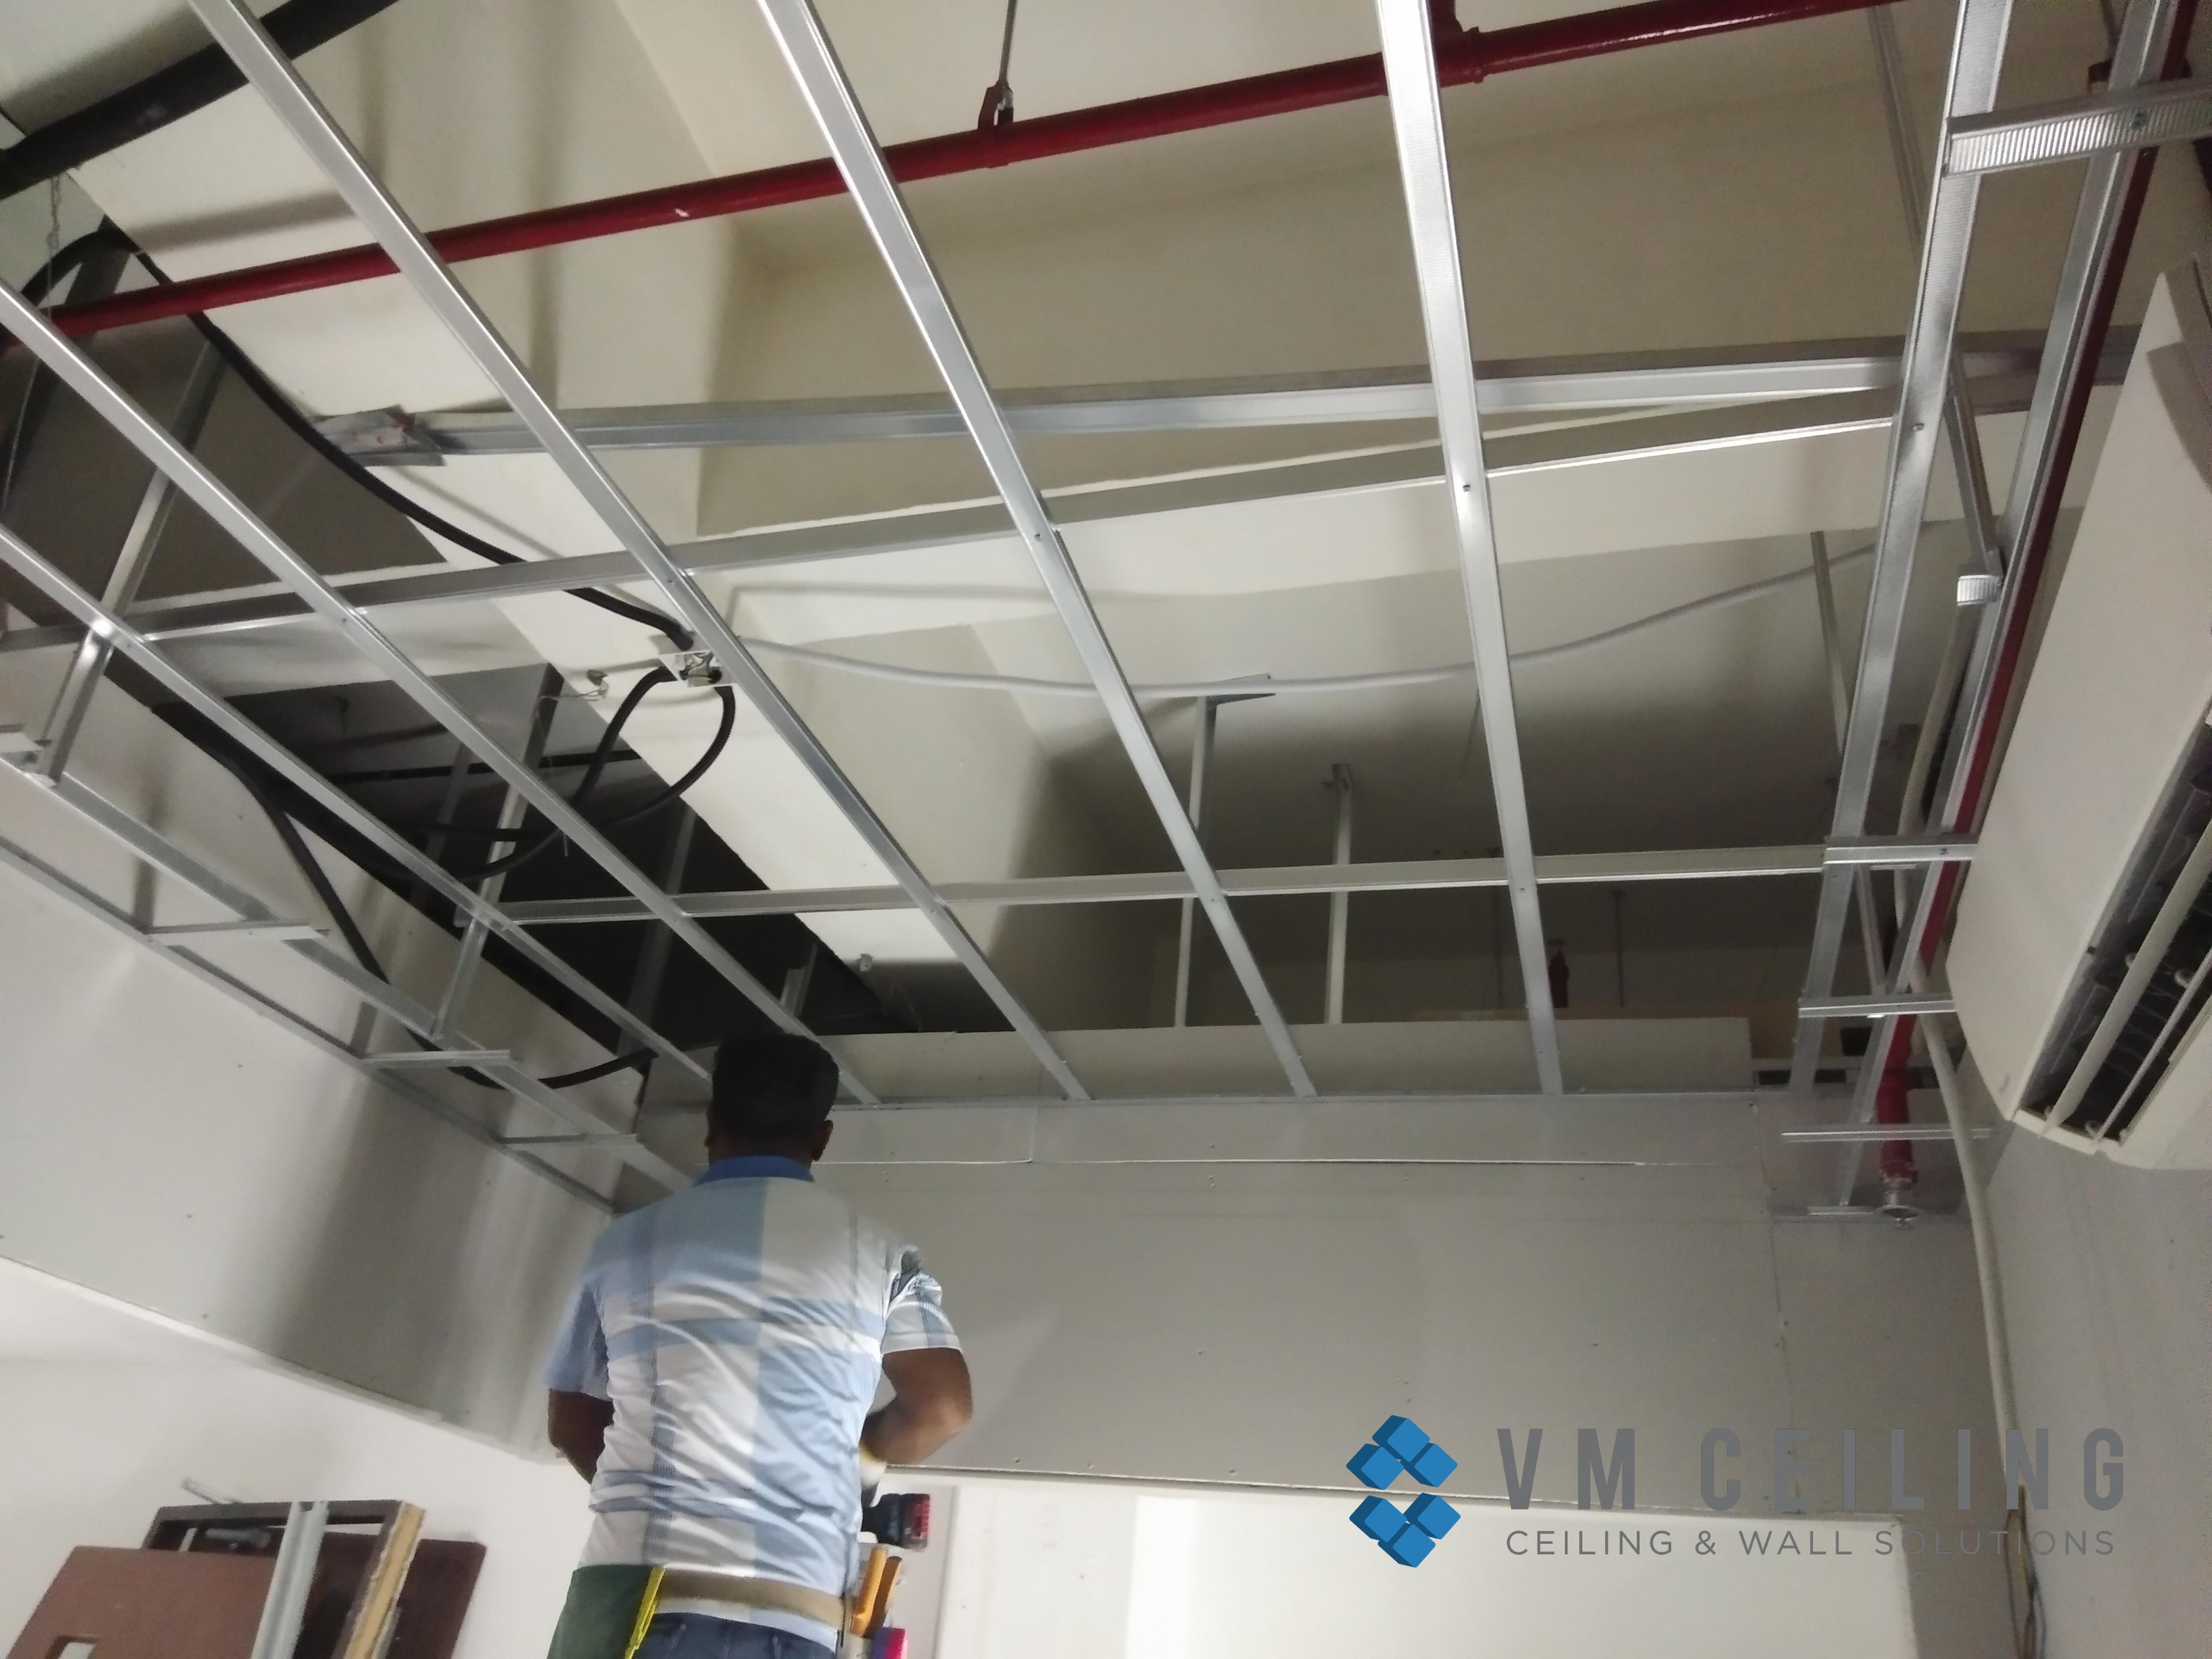 office meeting room false ceiling renovation vm ceiling singapore commercial bukit merah 2